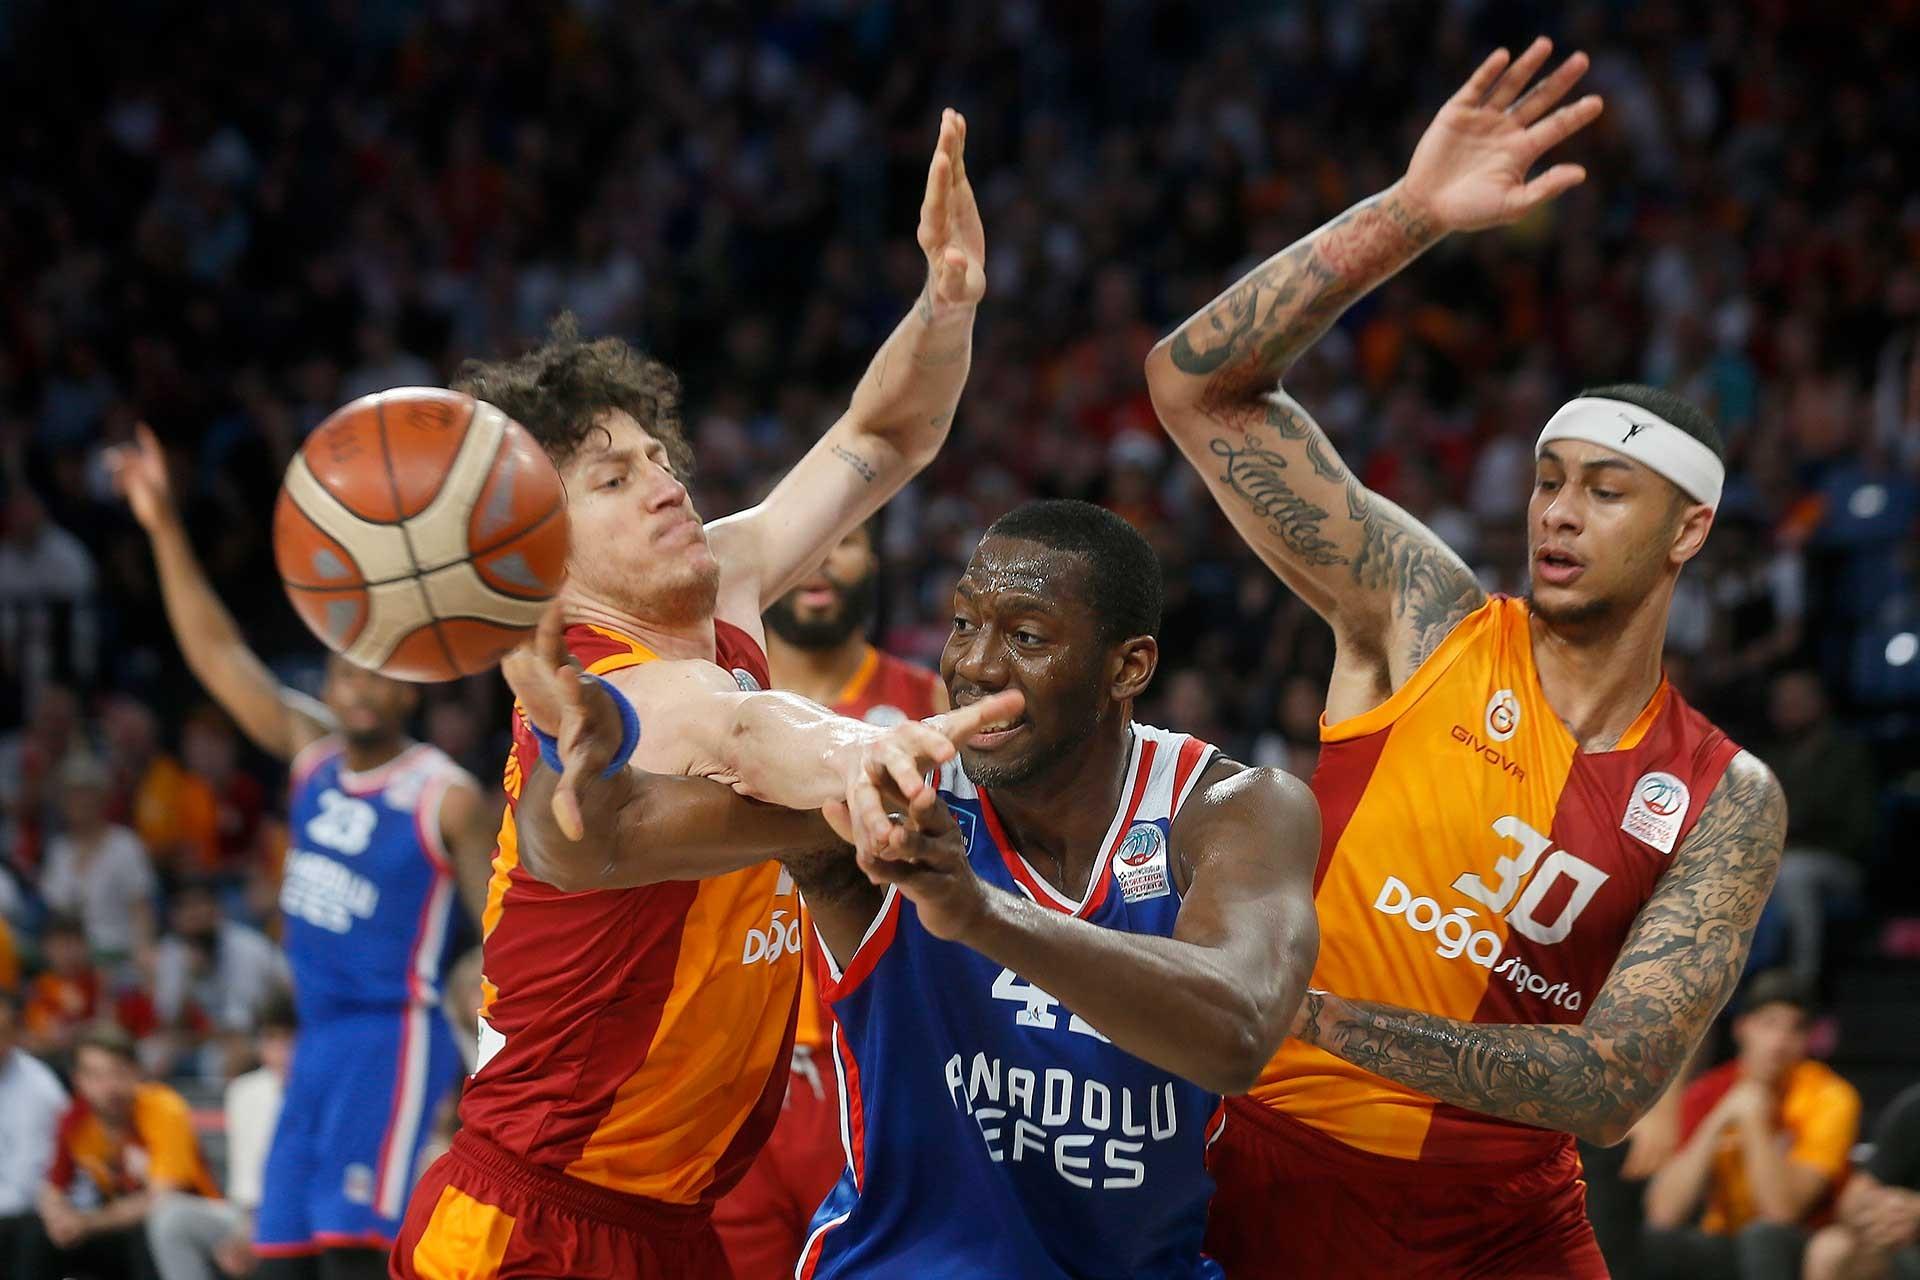 Basketbol Süper Liginde Galatasaray'ı eleyen Anadolu Efes finale yükseldi